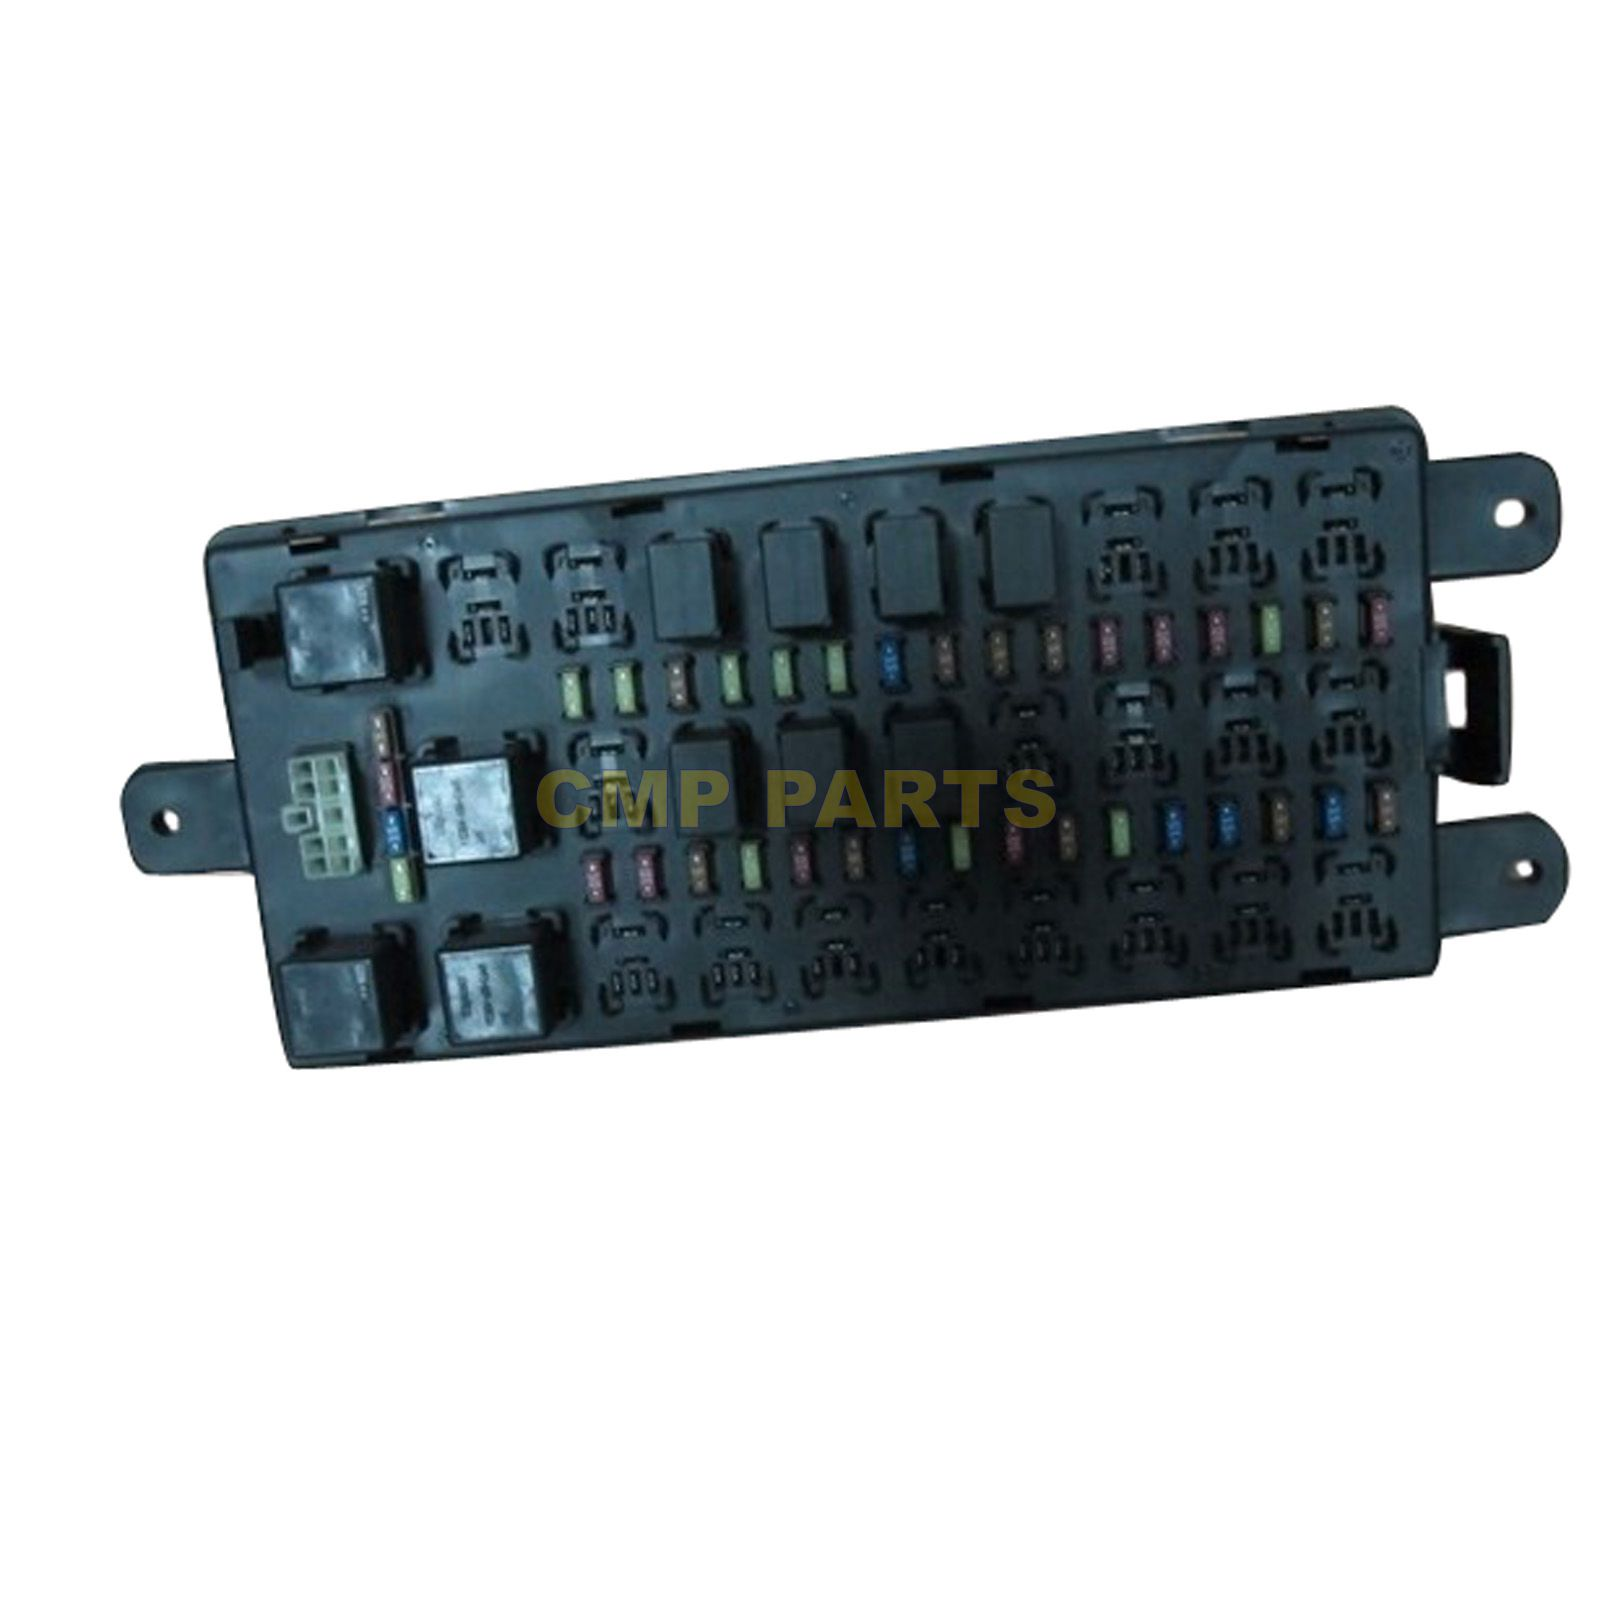 yn24e00016f2 kobelco fuse box assembly for excavator sk200 8 sk250 yn24e00016f2 kobelco fuse box assembly for excavator sk200 8 sk250 8